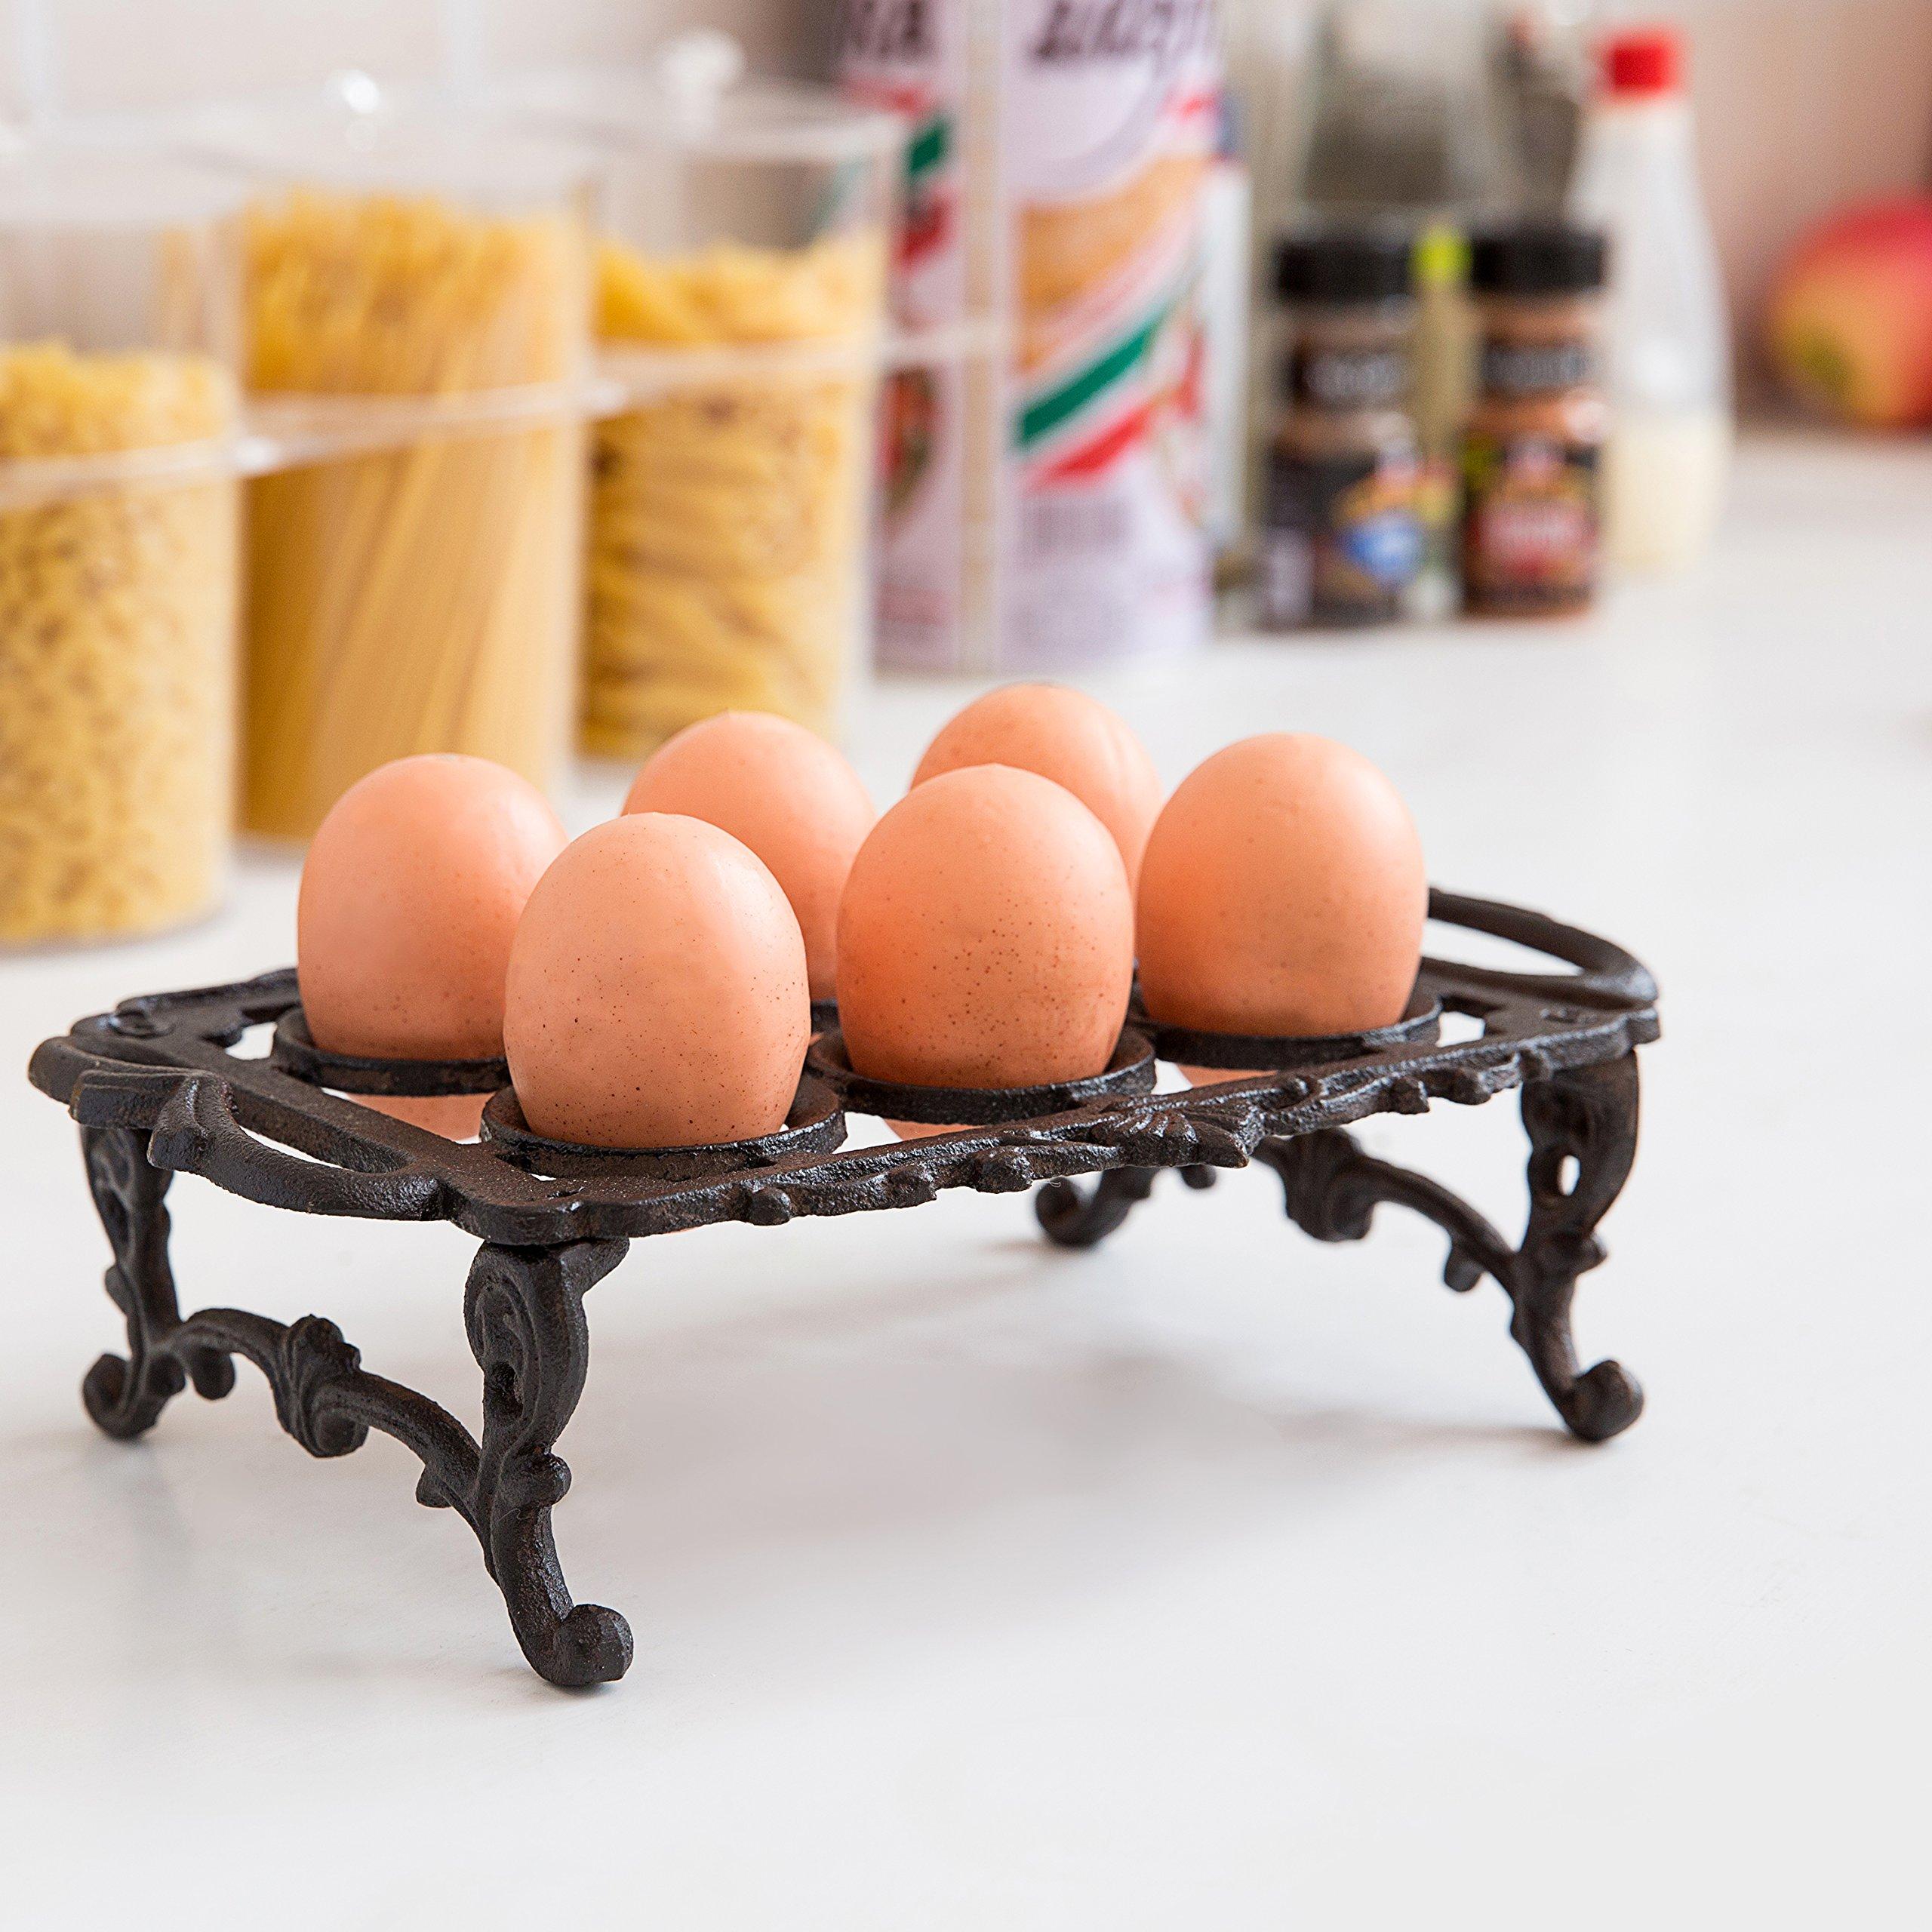 Cast Iron Vintage Style 6 Egg Holder Tray / Kitchen Storage Display Rack with Handles, Black